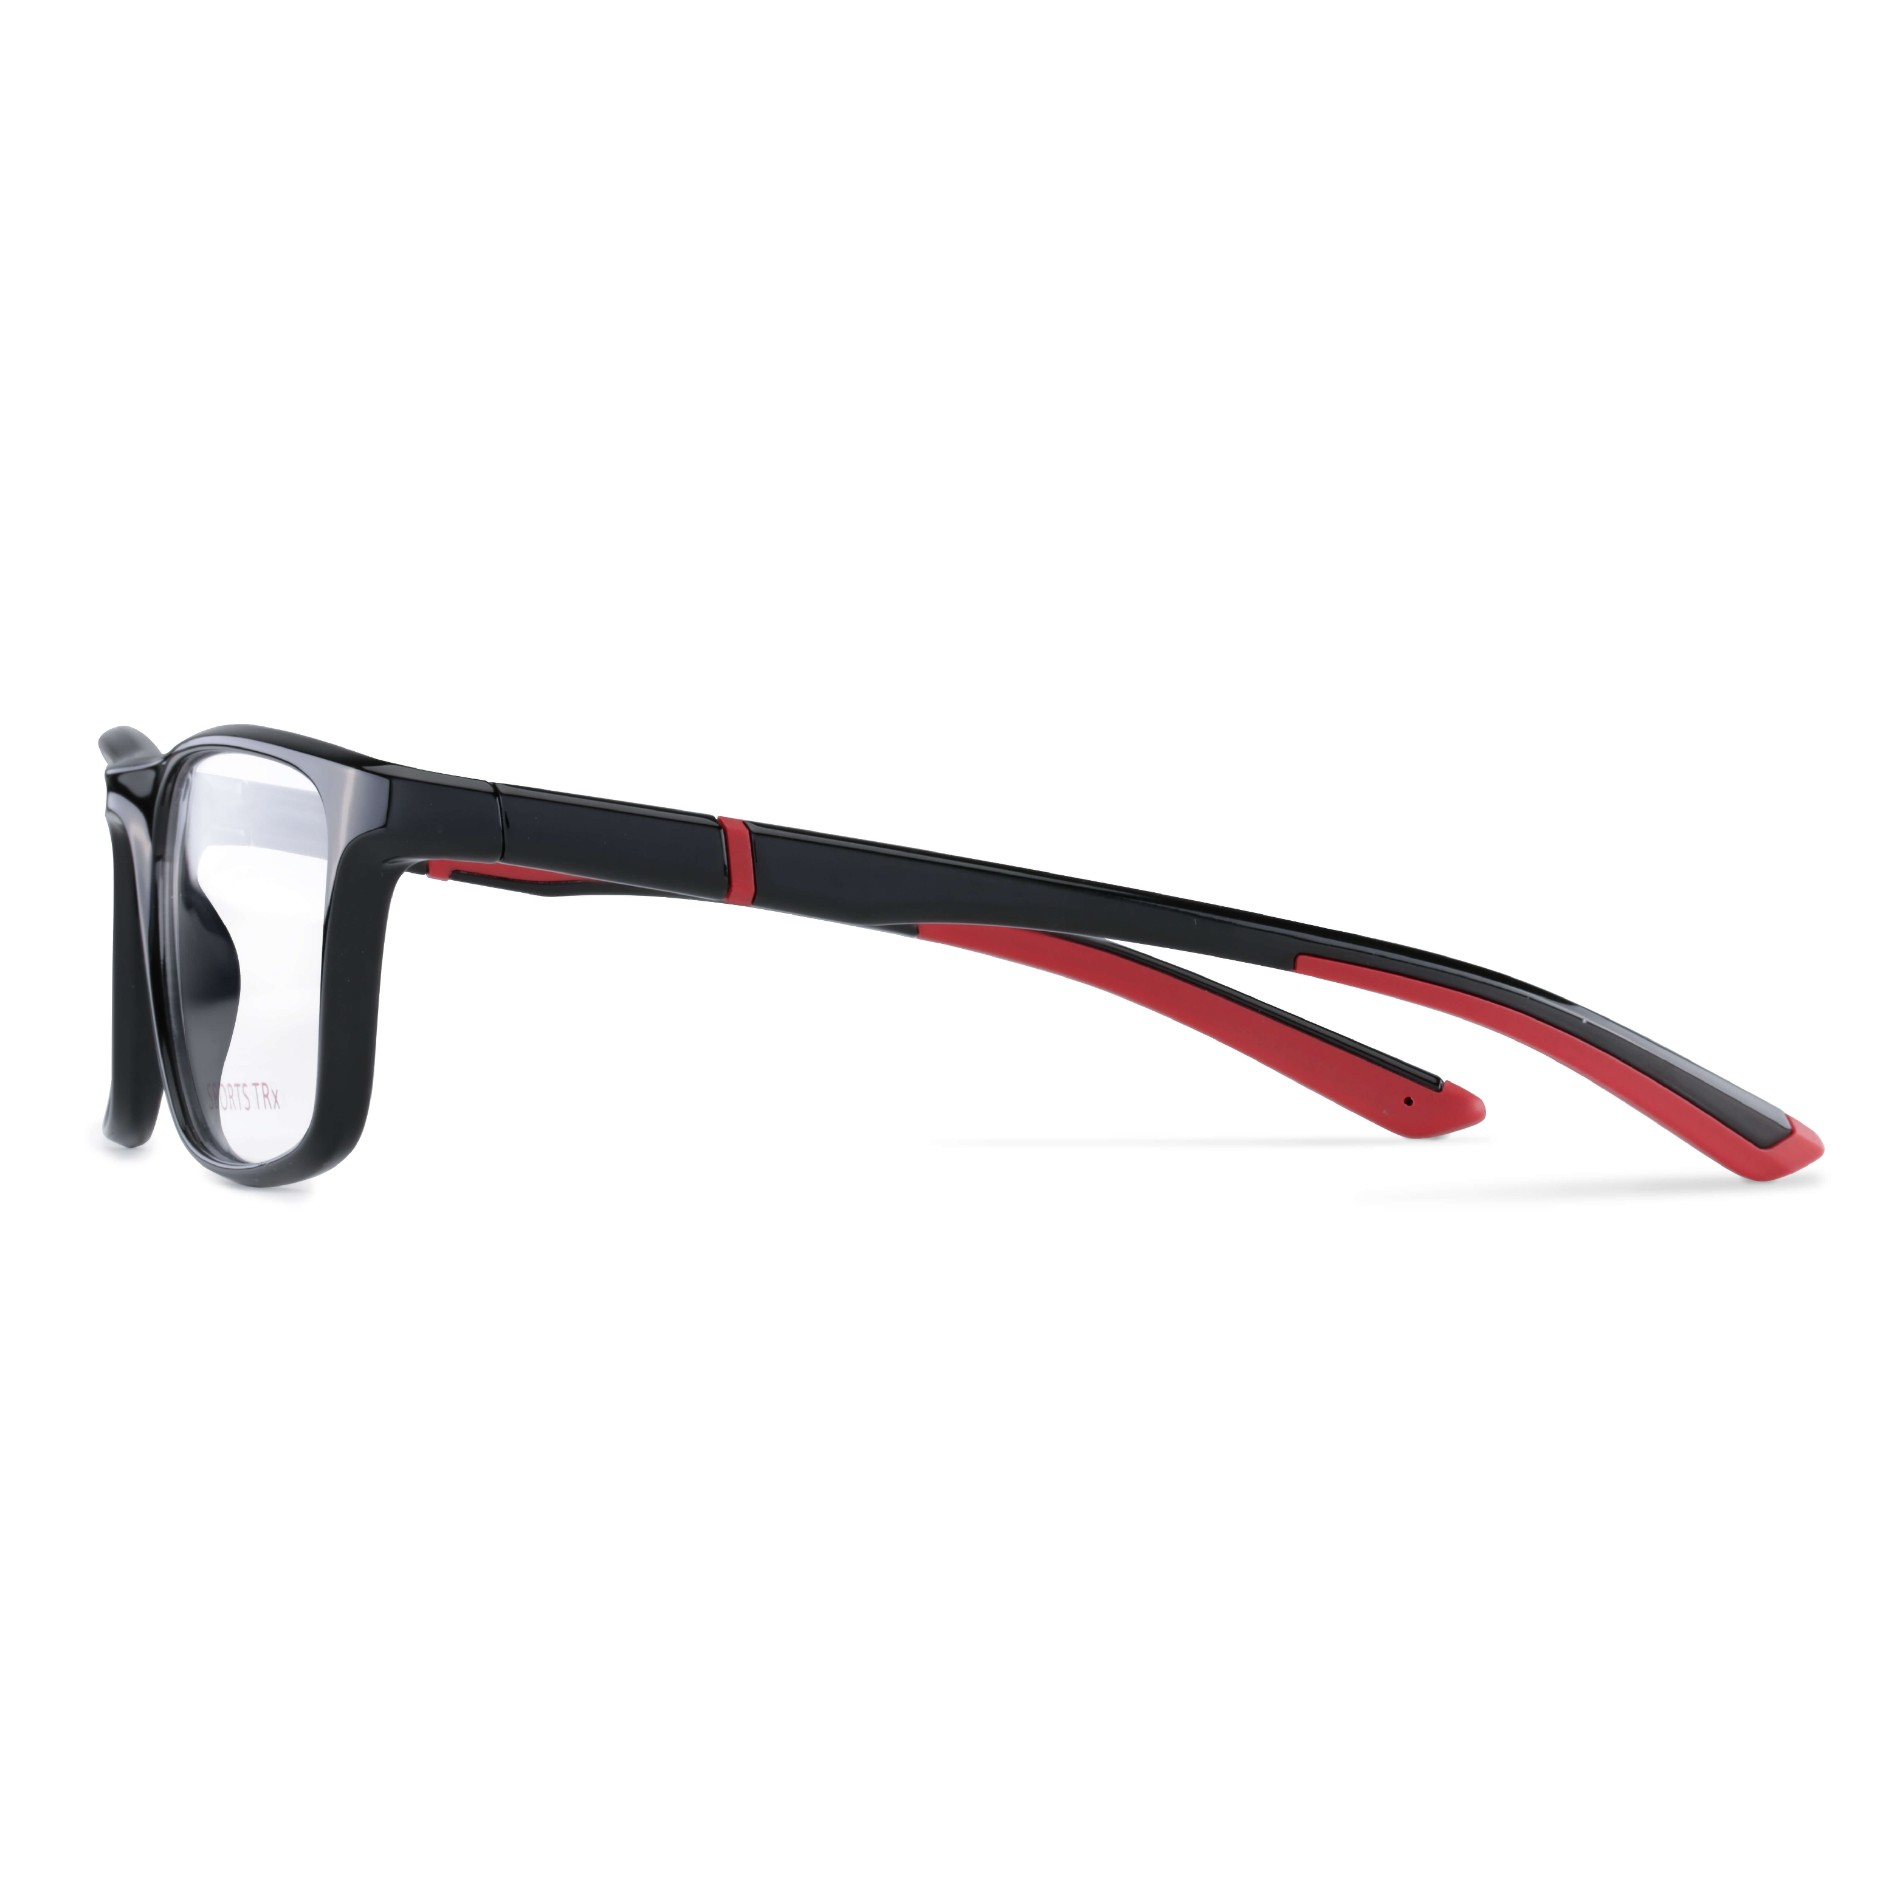 Sports TR90 Glasses Super Durable Outdoor Prescription Eyeglasses Frames with Face Shield Manufacturers, Sports TR90 Glasses Super Durable Outdoor Prescription Eyeglasses Frames with Face Shield Factory, Supply Sports TR90 Glasses Super Durable Outdoor Prescription Eyeglasses Frames with Face Shield